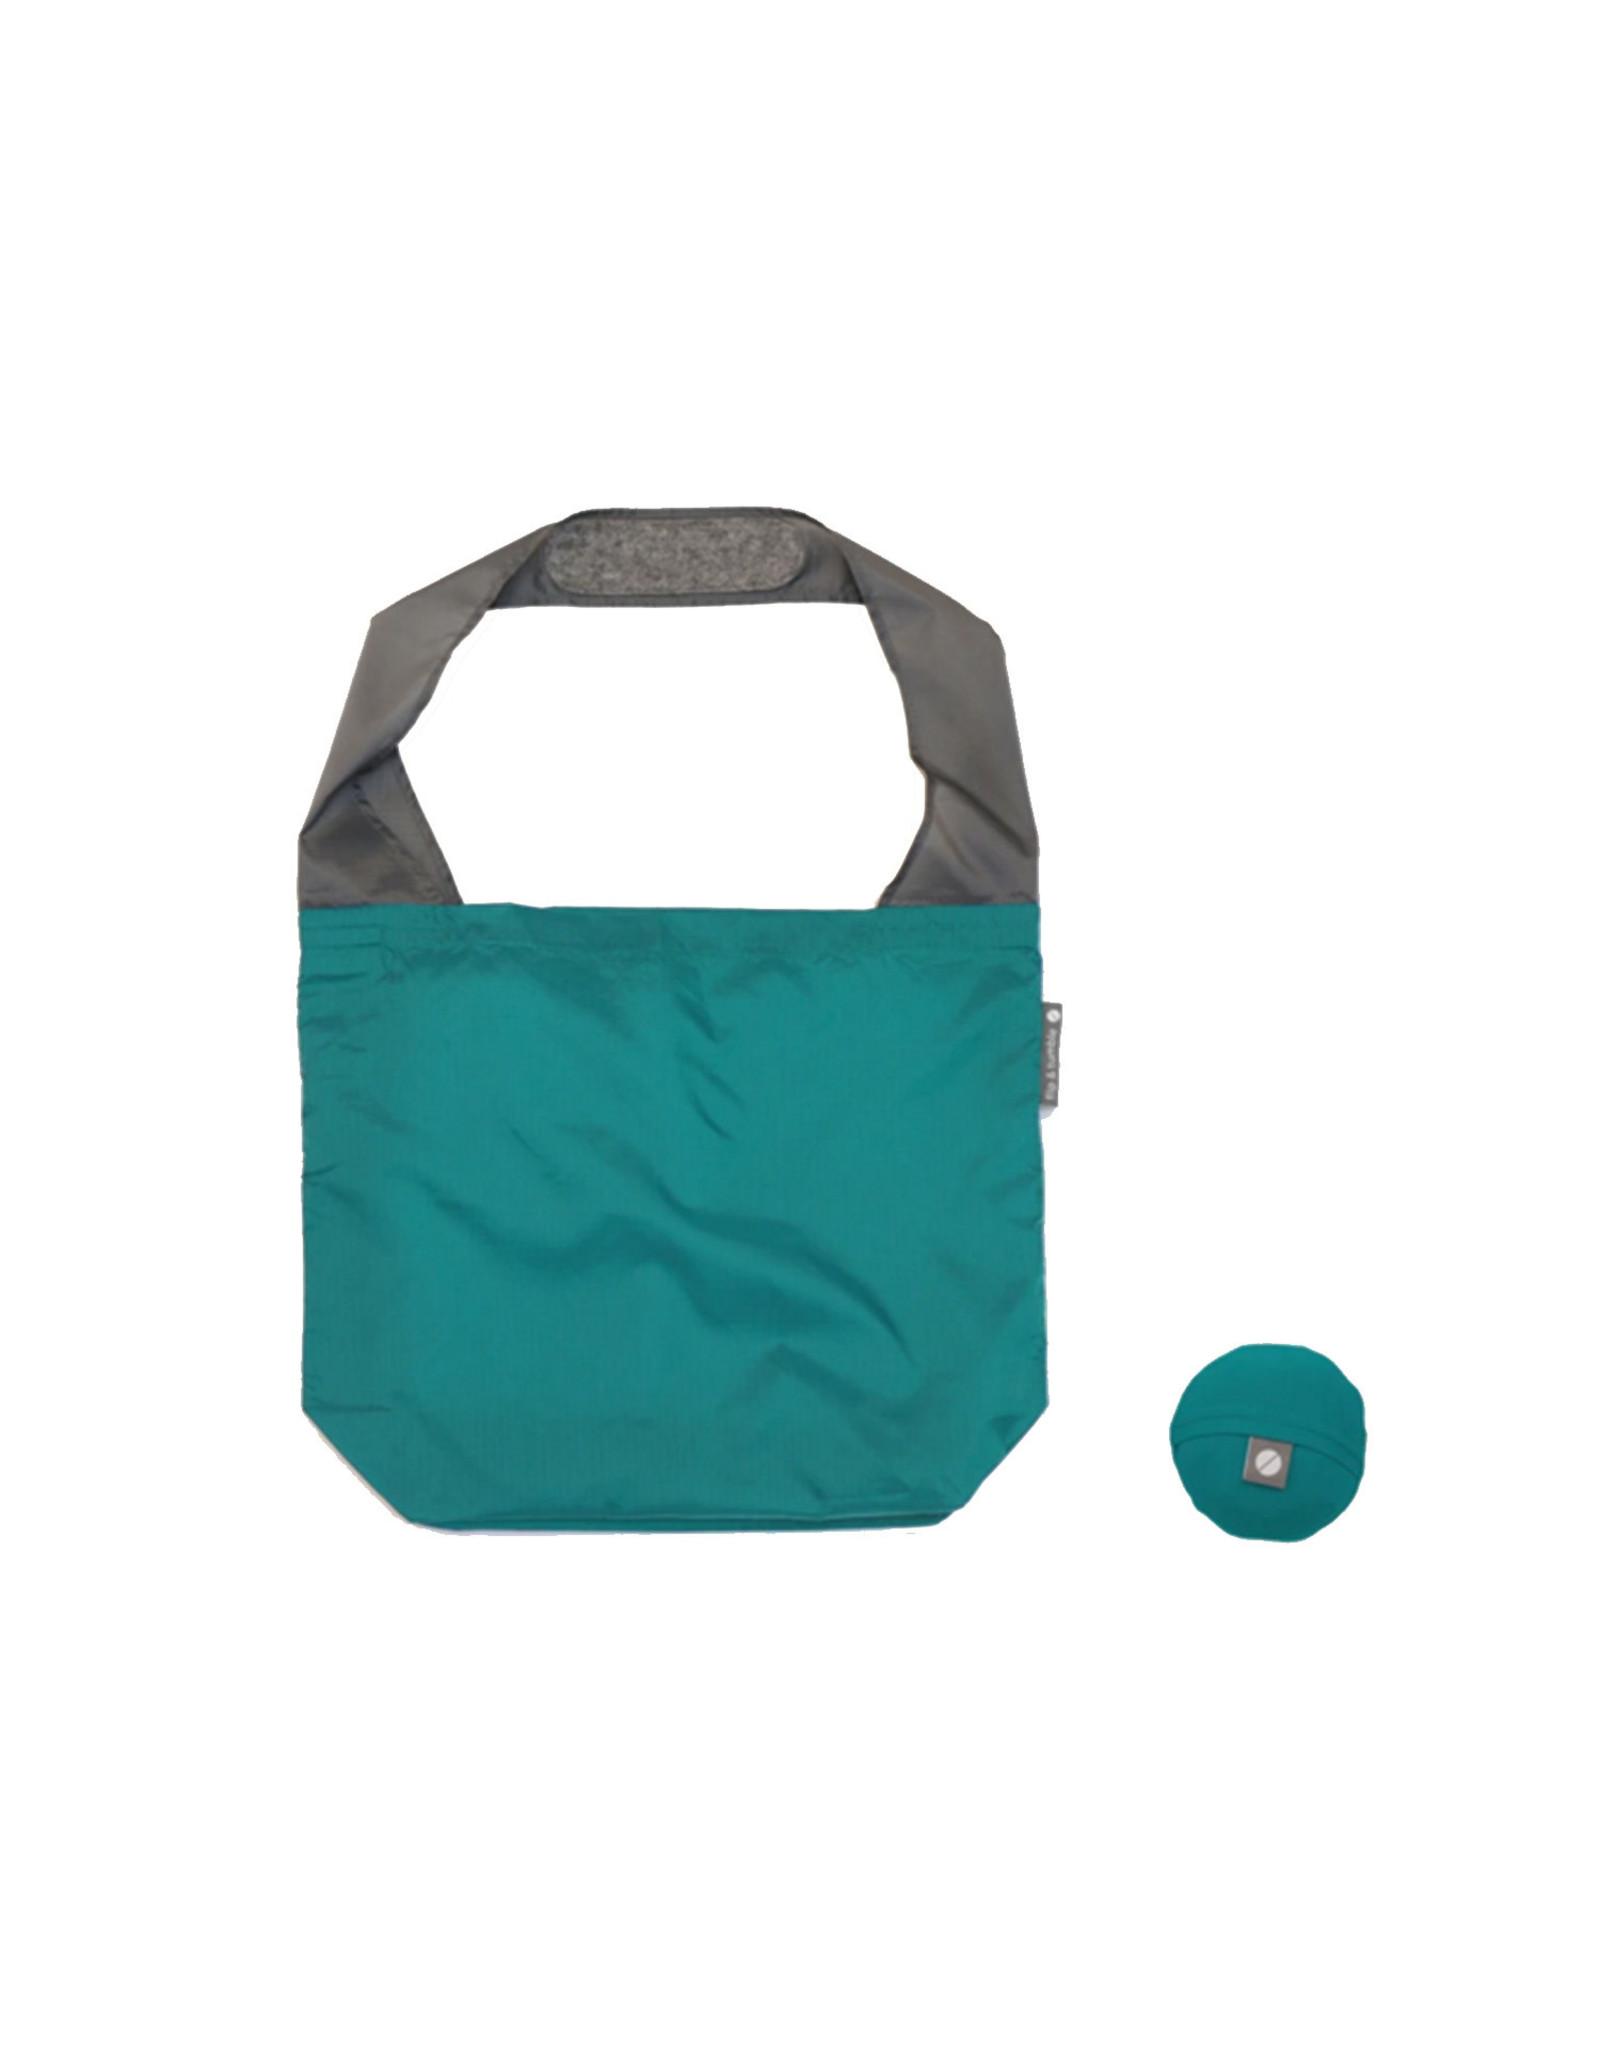 Flip & Tumble 24/7 Bag, Peacock